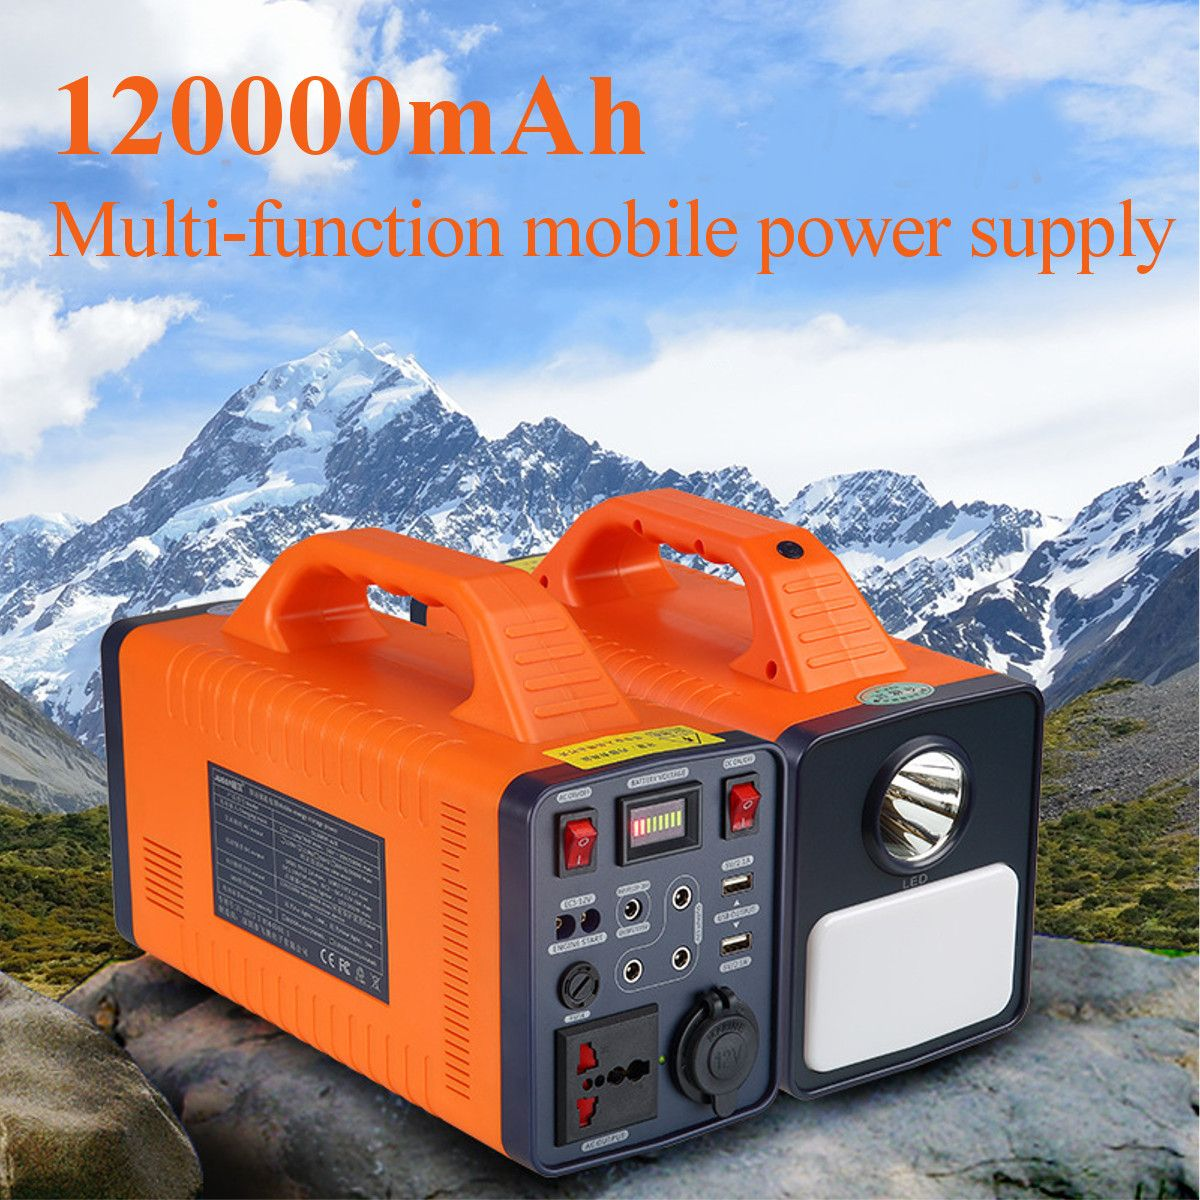 120000 mah 444Wh 300 watt Tragbare Solar Power Lagerung Generator Inverter Camping Licht Multifunktions Tragbare Mobile Power Versorgung